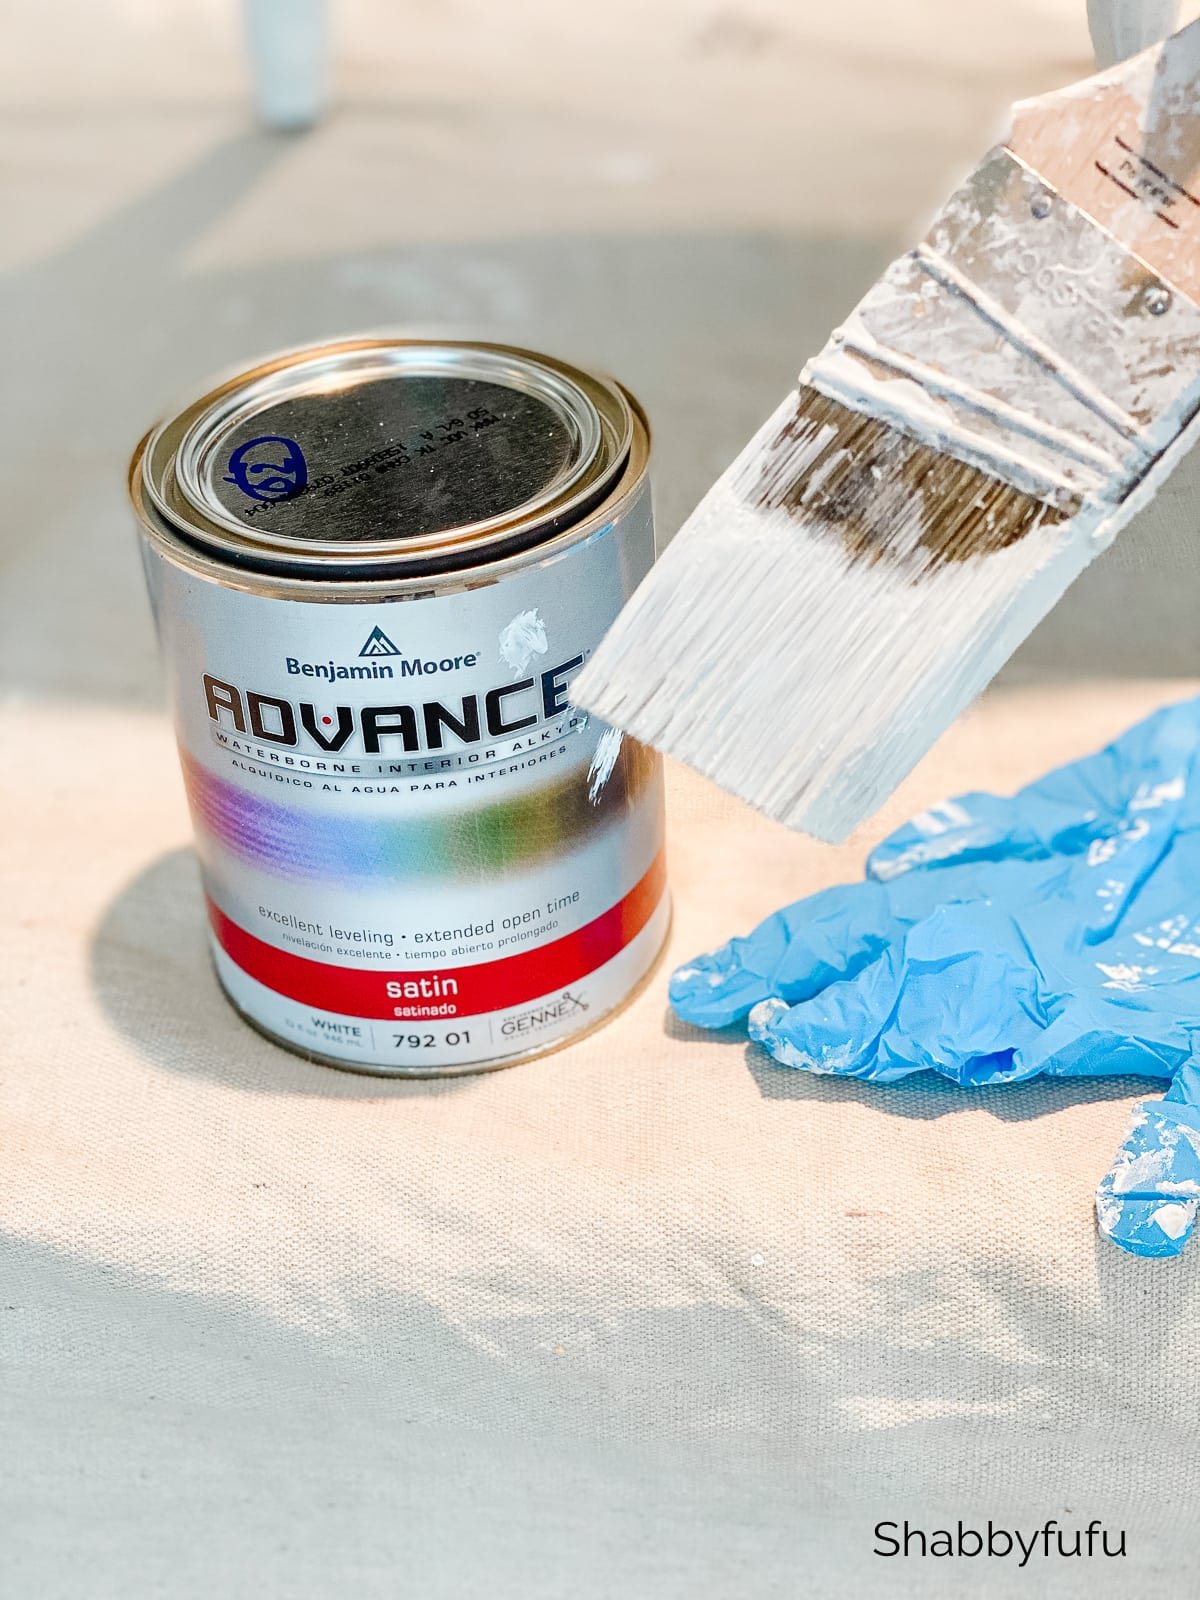 benjamin moore advance paint satin white